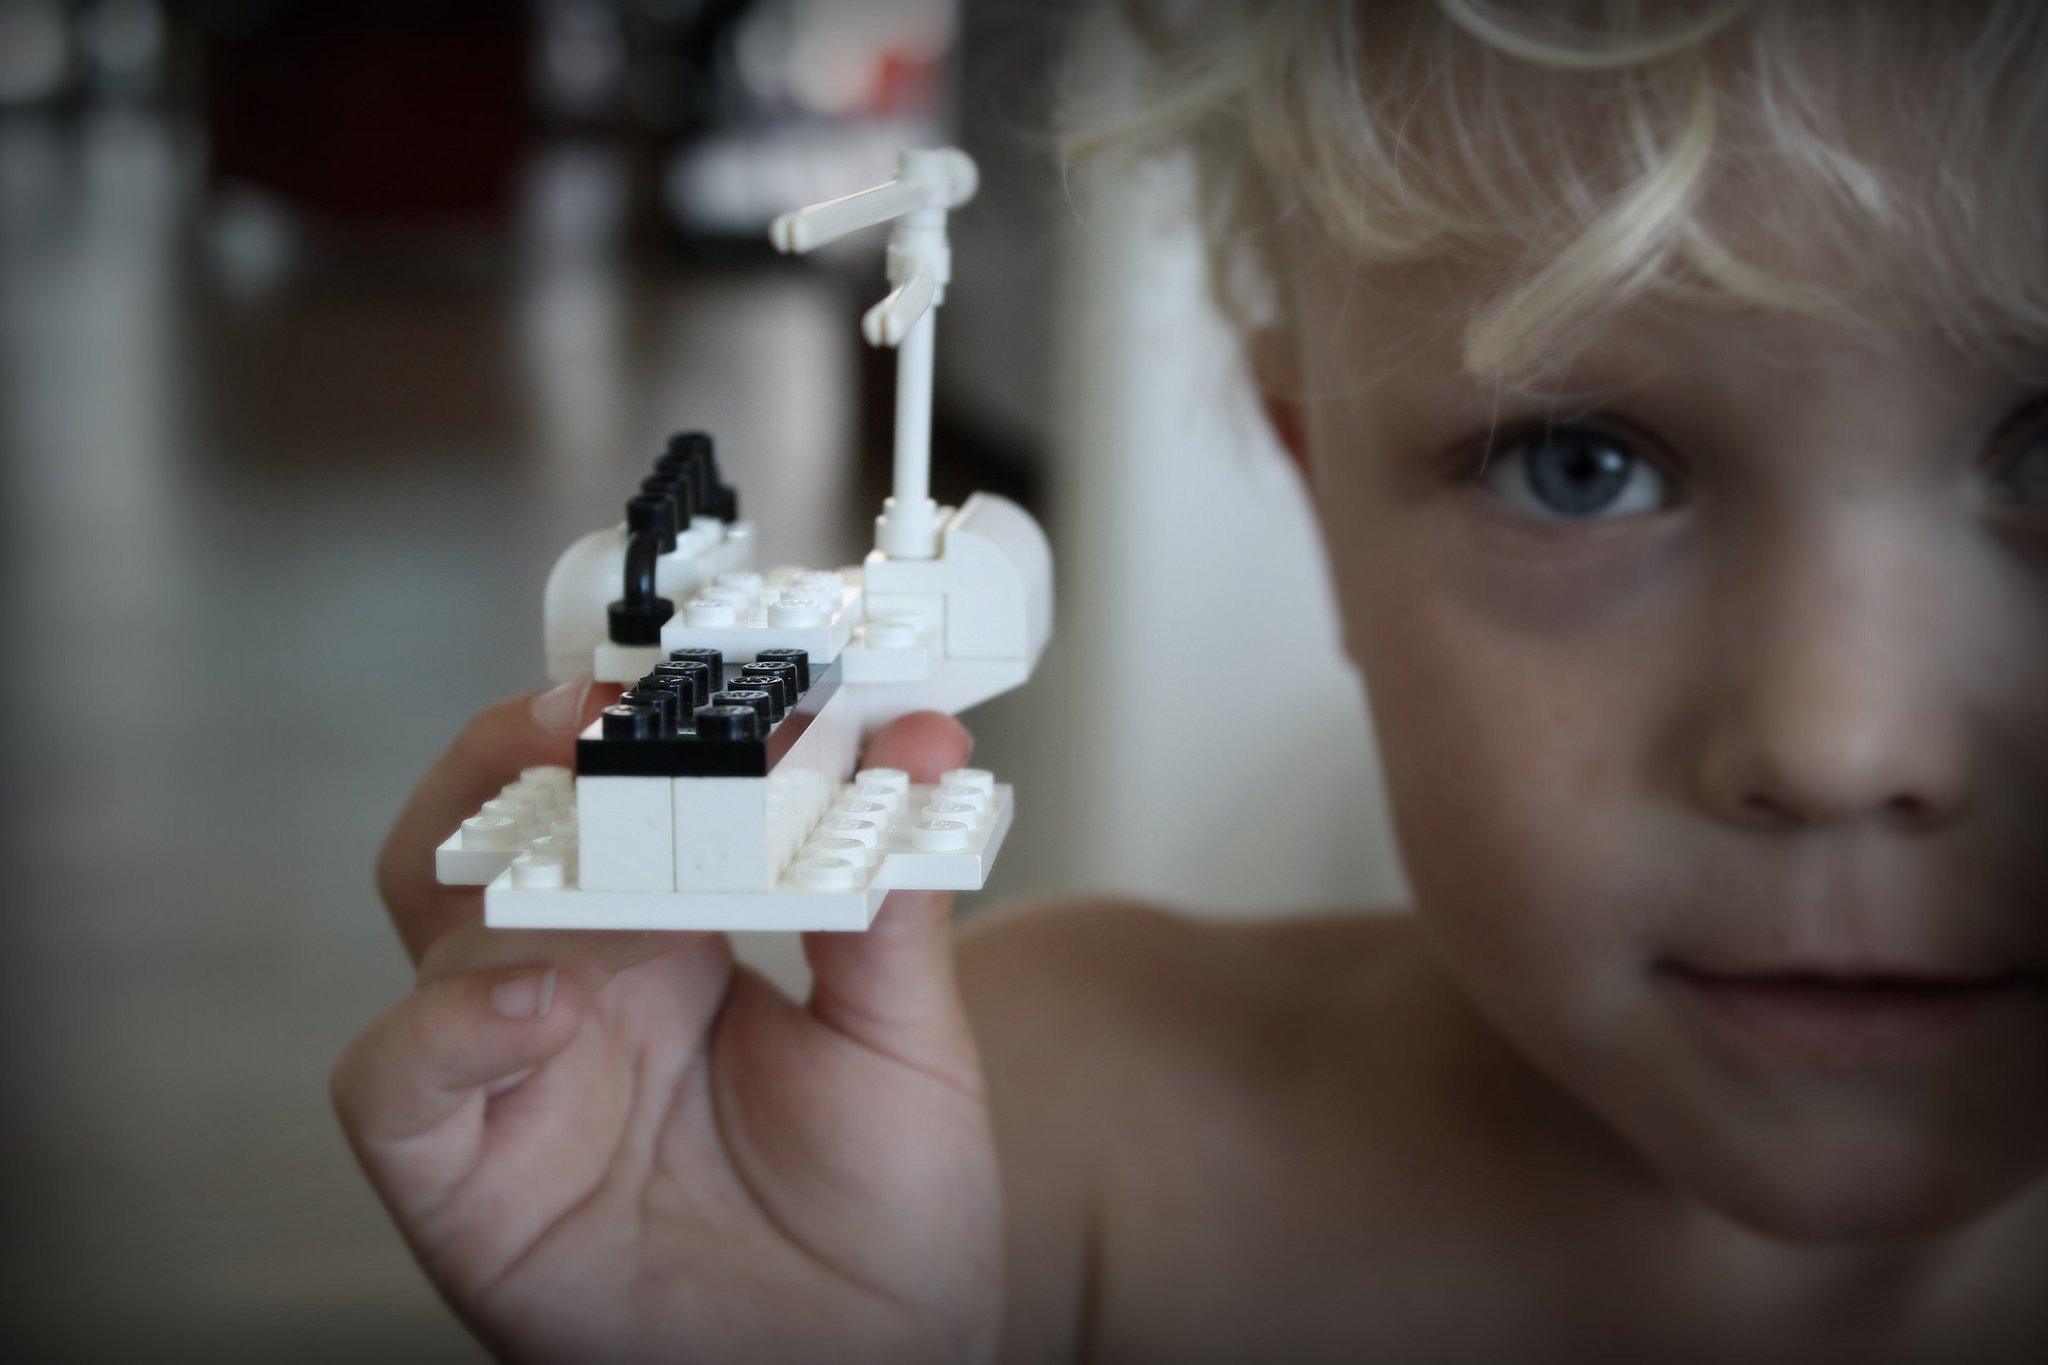 Build and Break Lego Creations